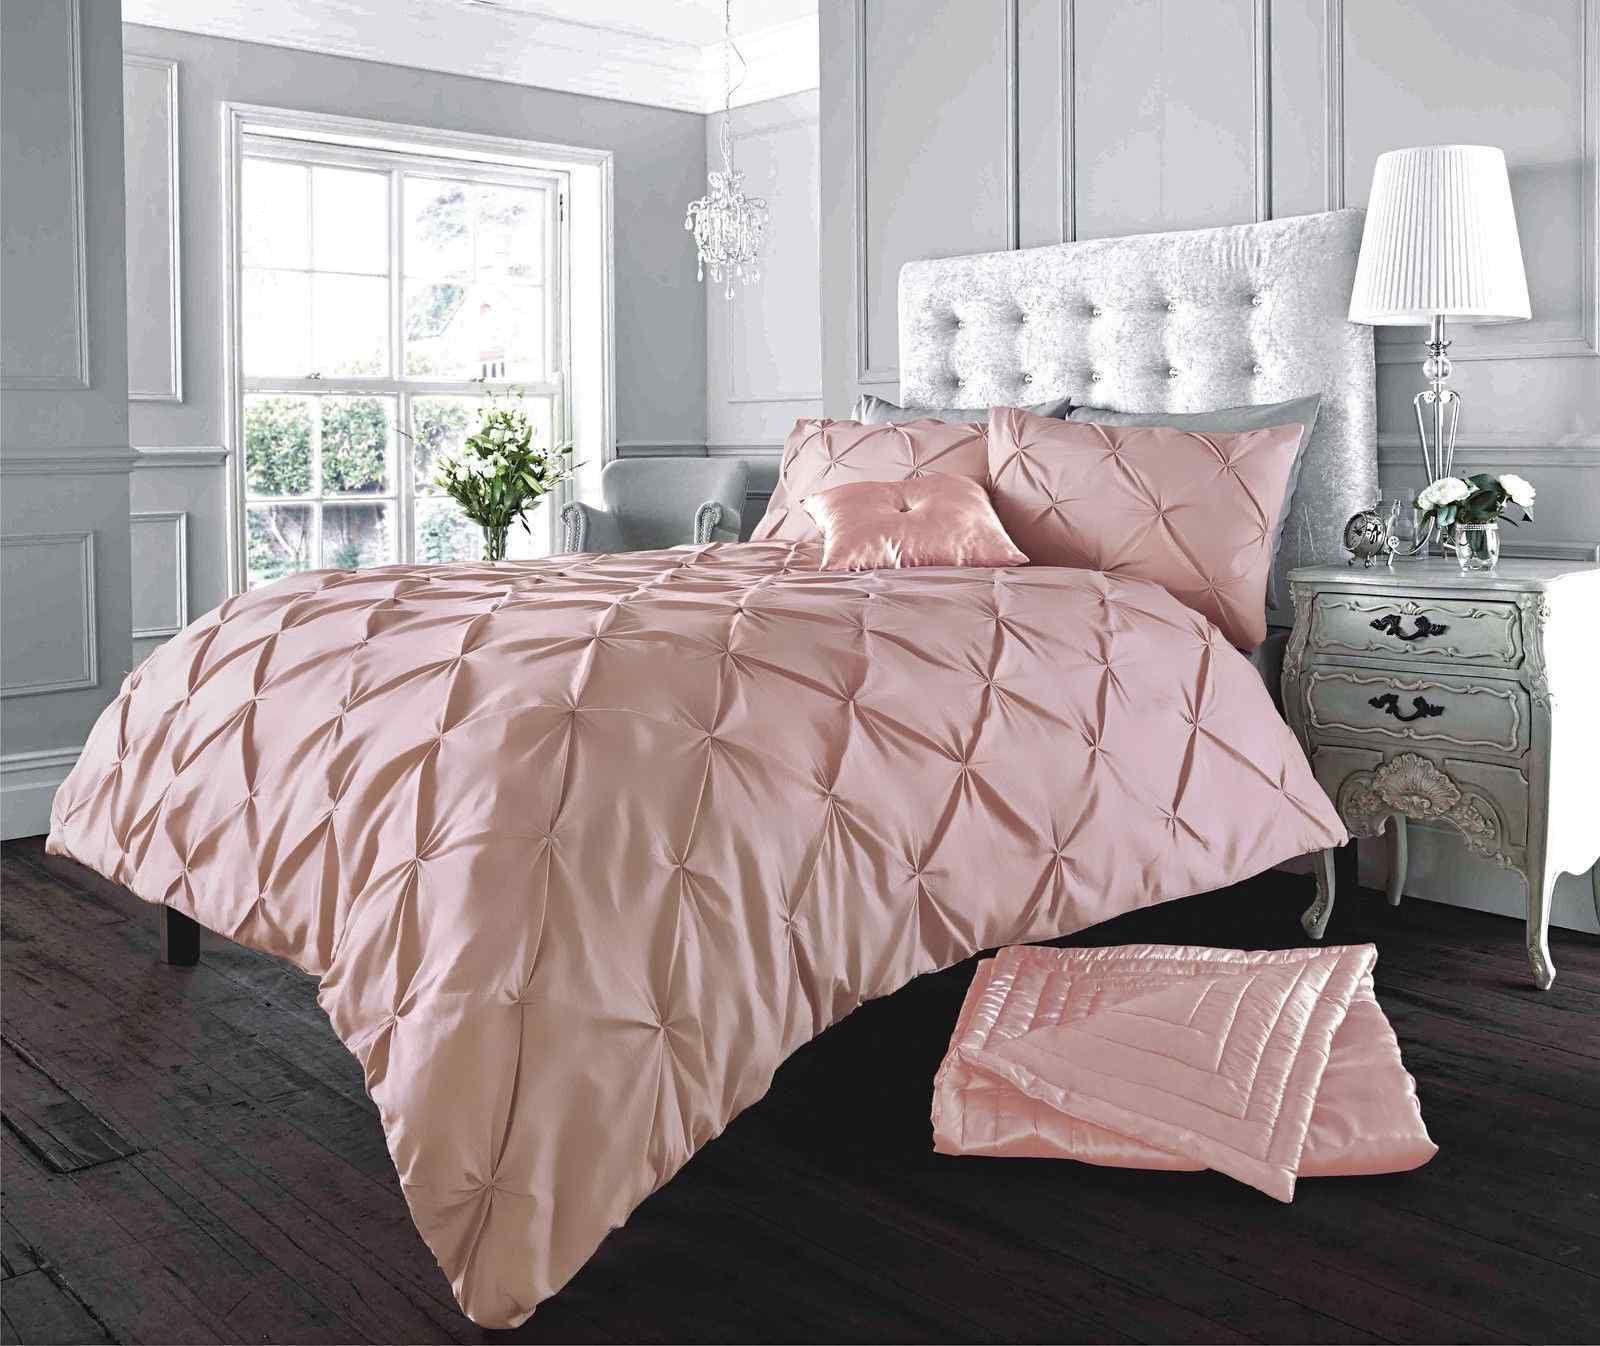 Stylish Alford Soft Pink Duvet Quilt Cover Set Linens Range Duvet Cover Sets Bed Linens Luxury Dusty Pink Bedroom